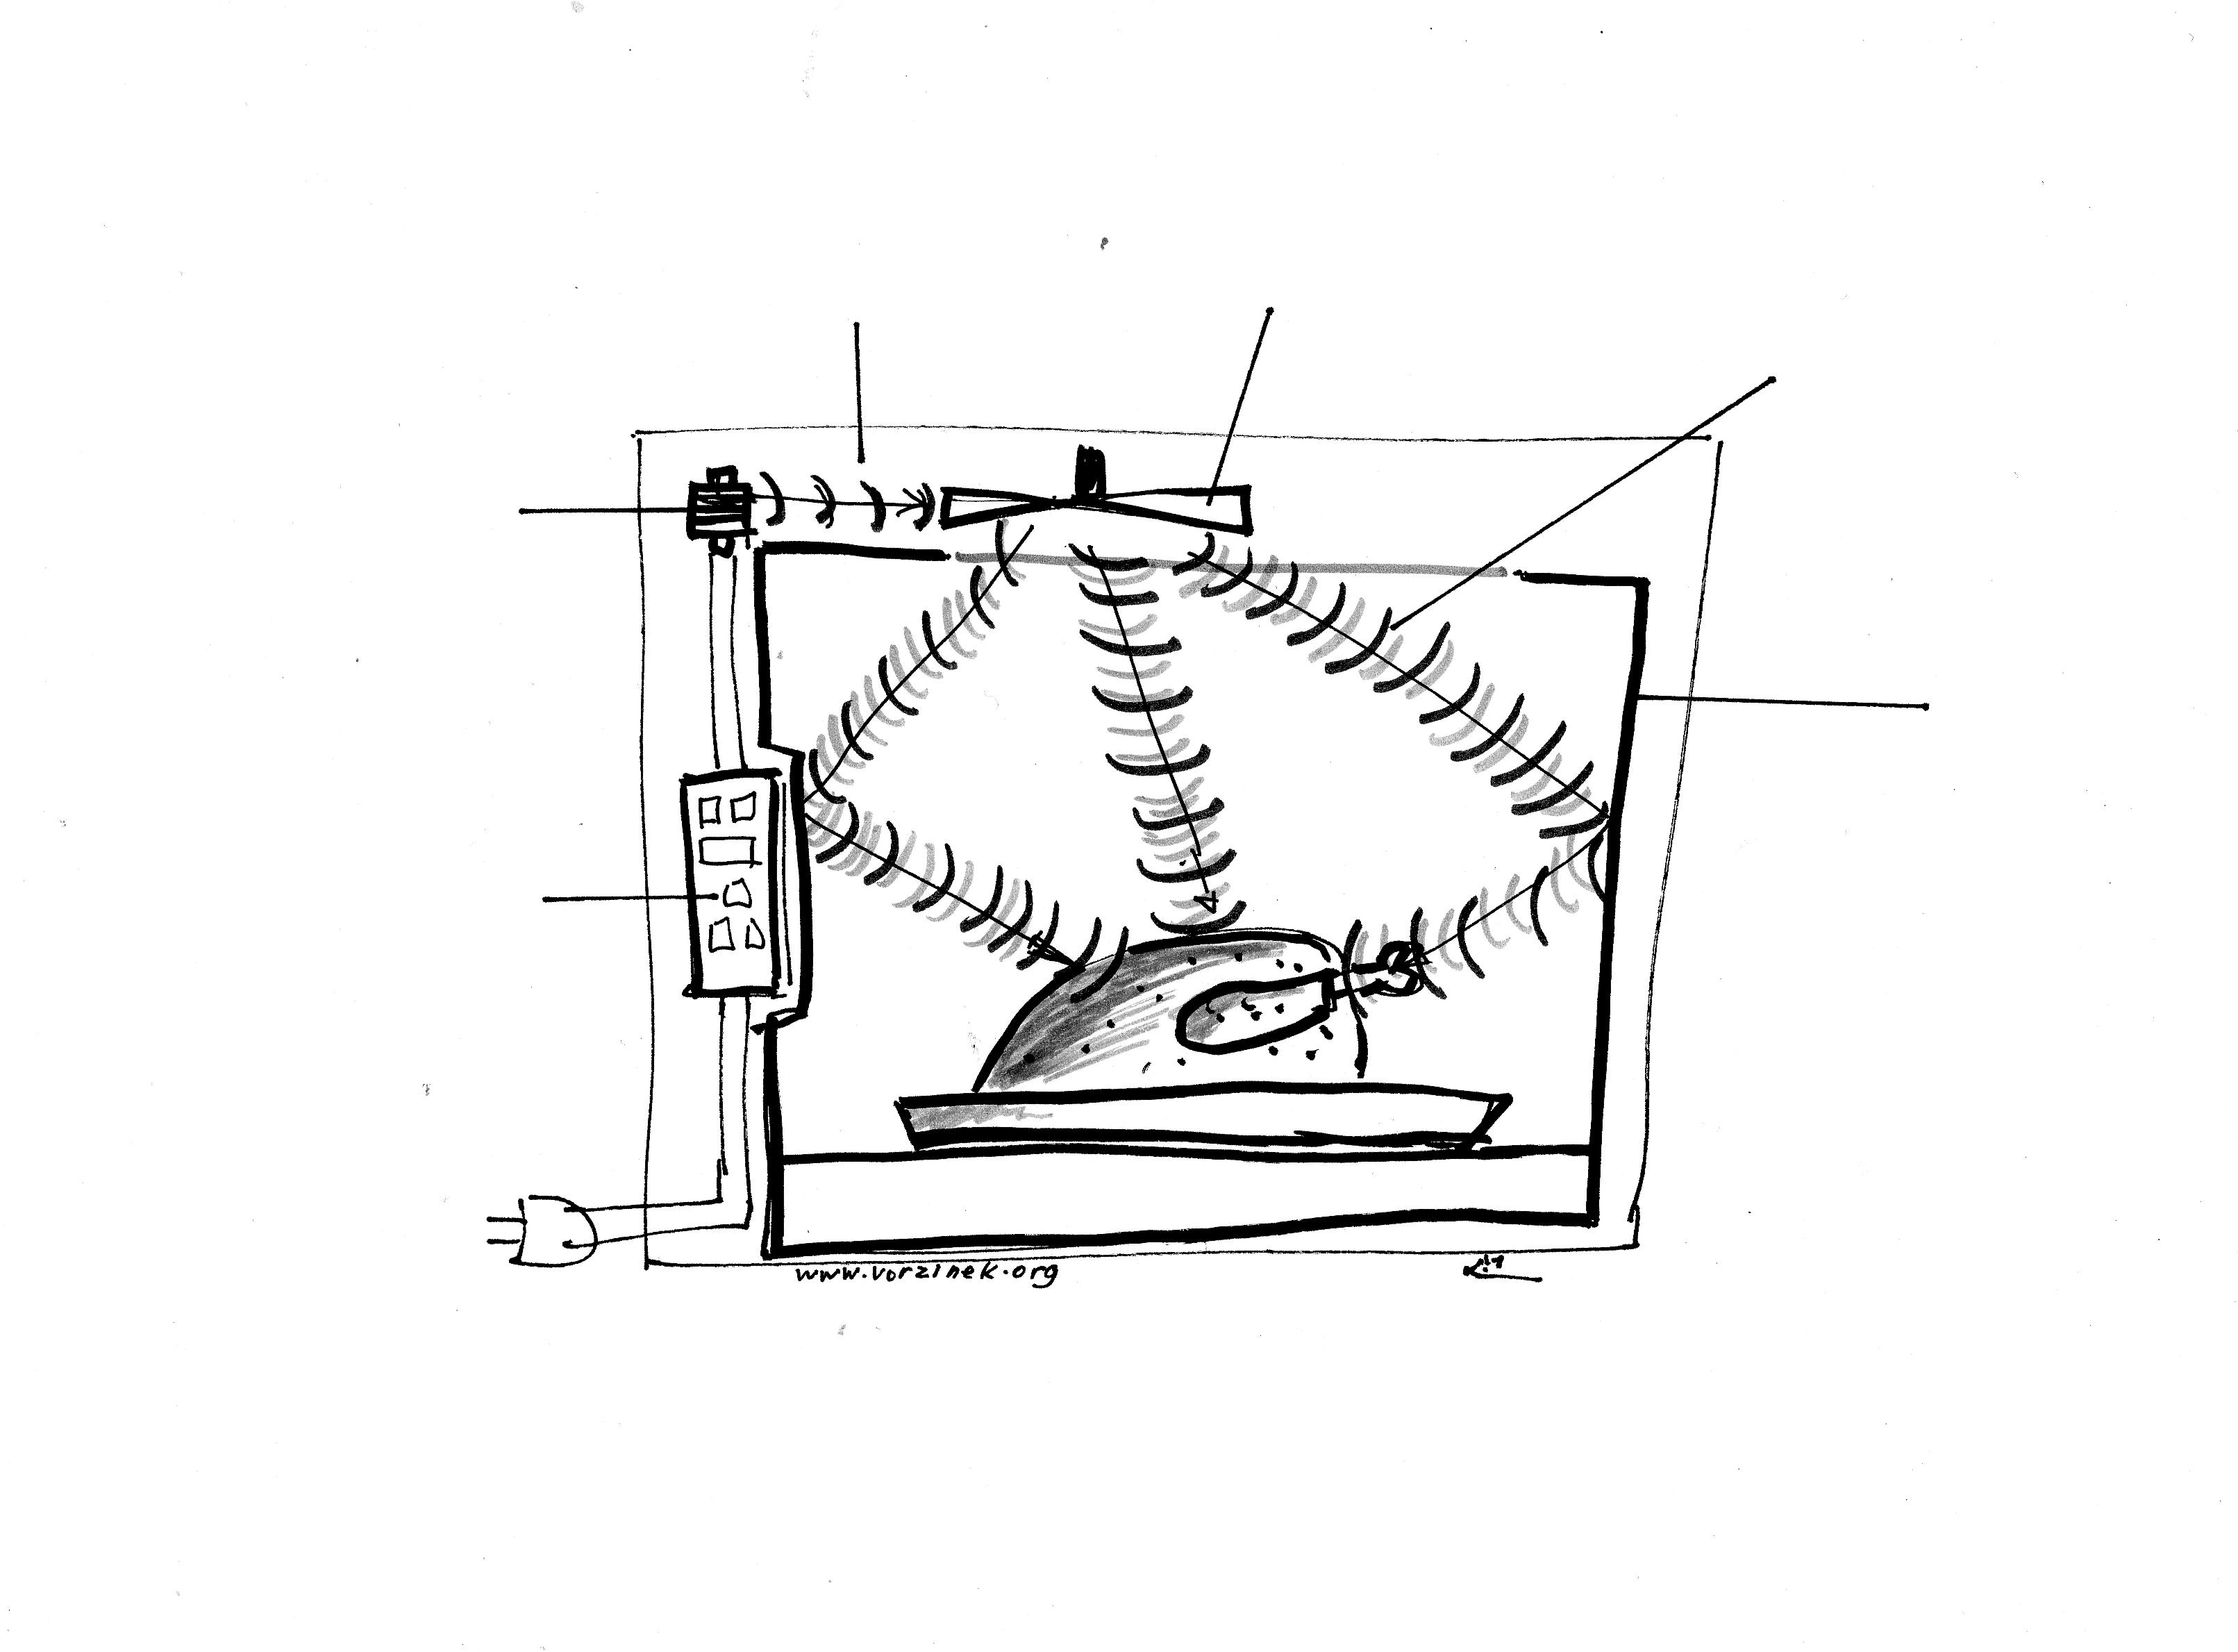 dimension micro onde cheap extrait du mode duemploi. Black Bedroom Furniture Sets. Home Design Ideas